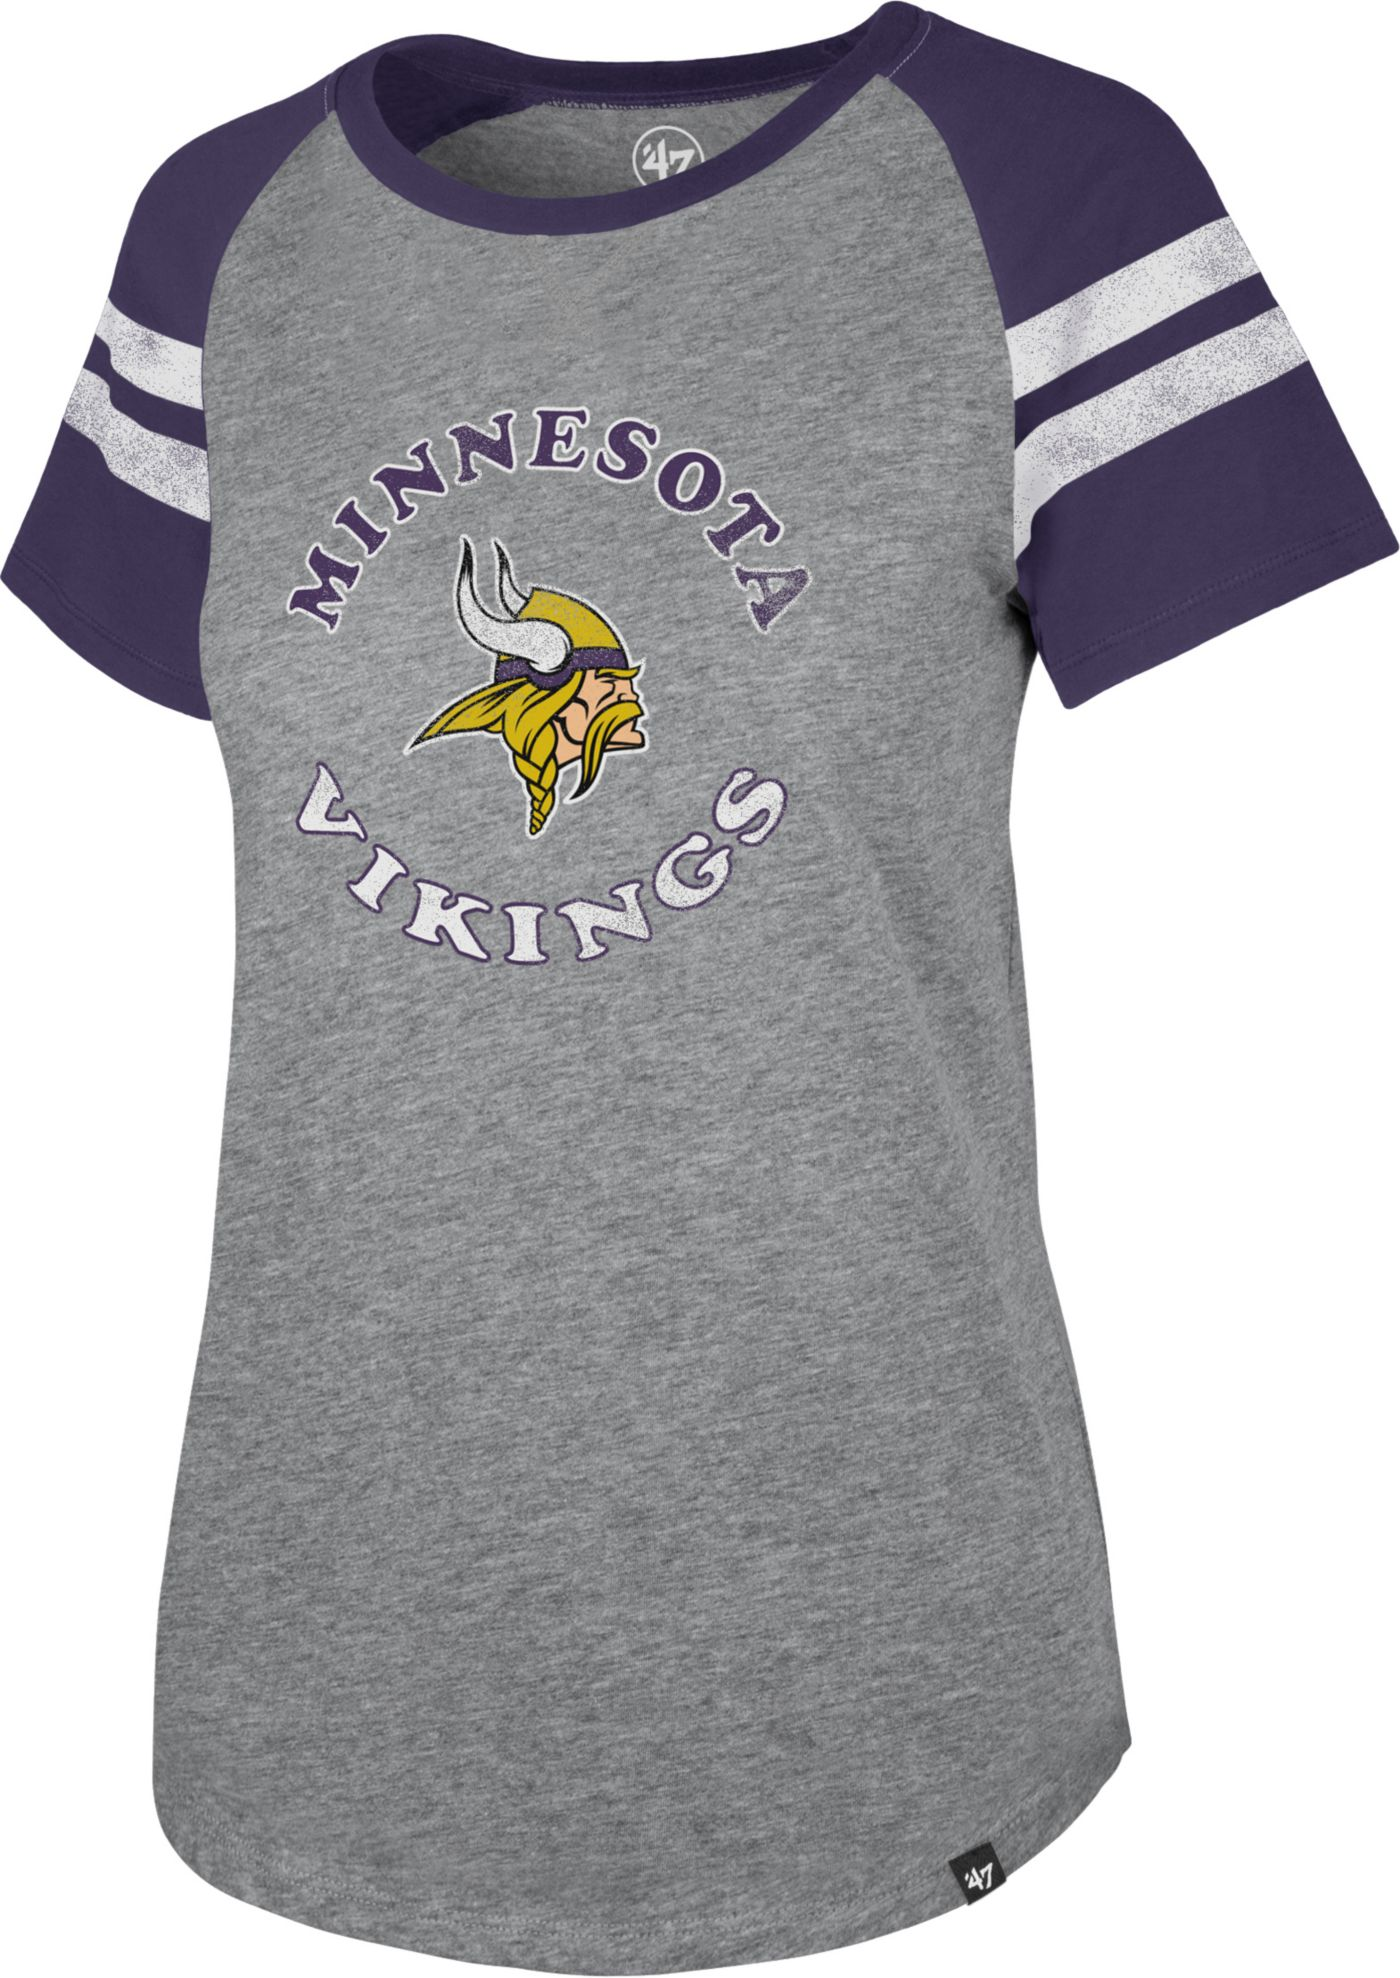 '47 Women's Minnesota Vikings Fly Out Raglan T-Shirt